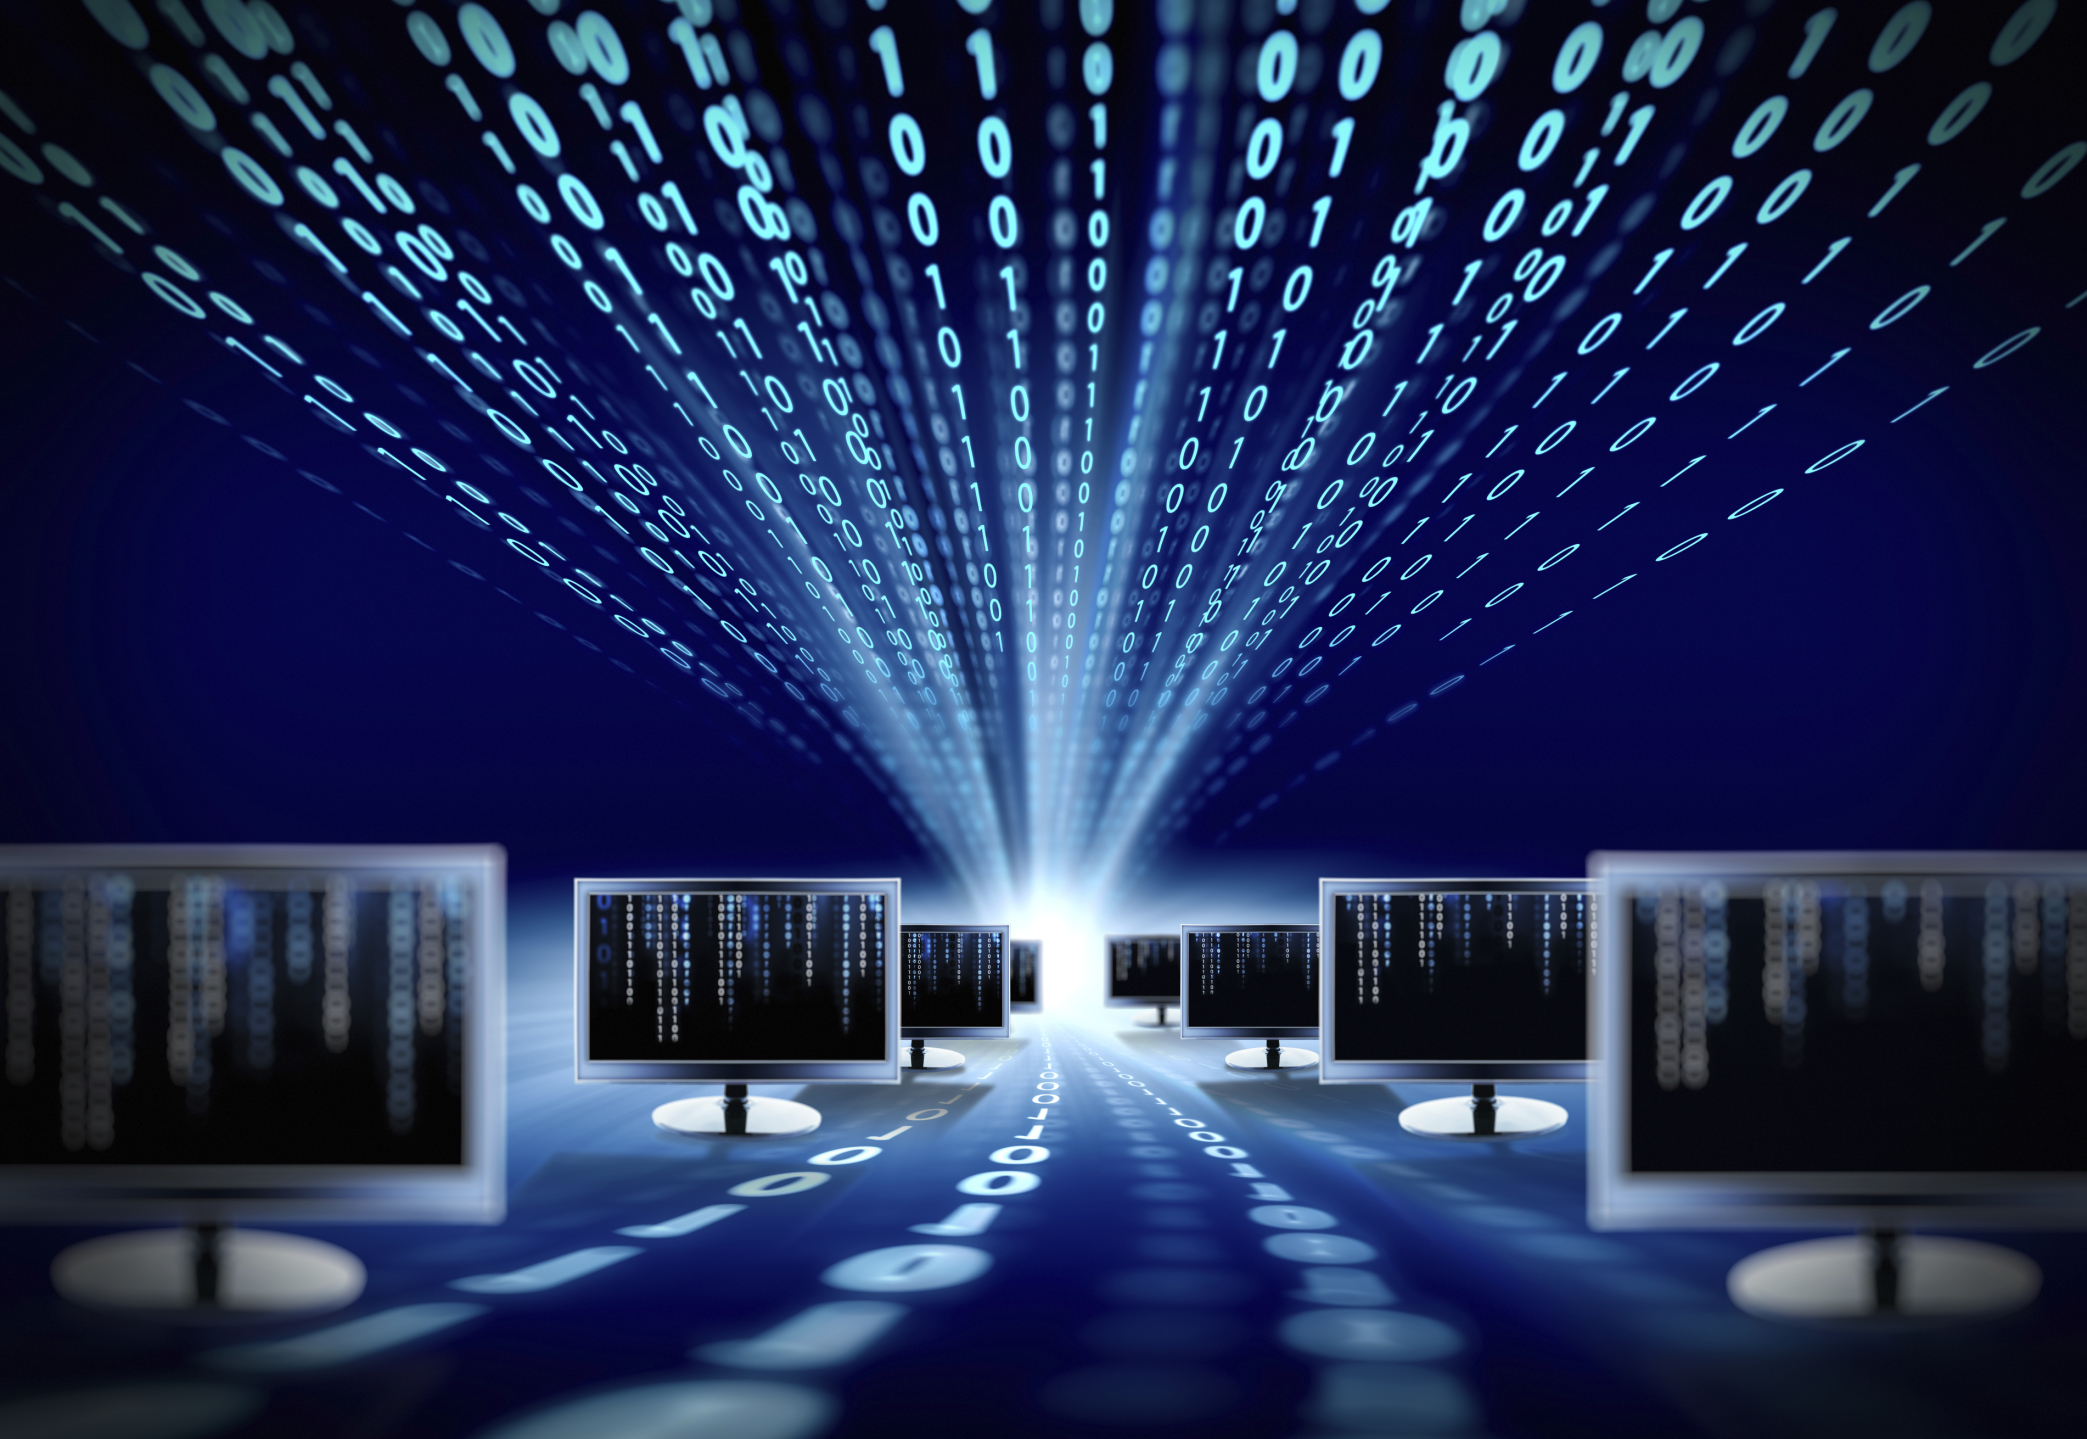 binary code and computer monitors